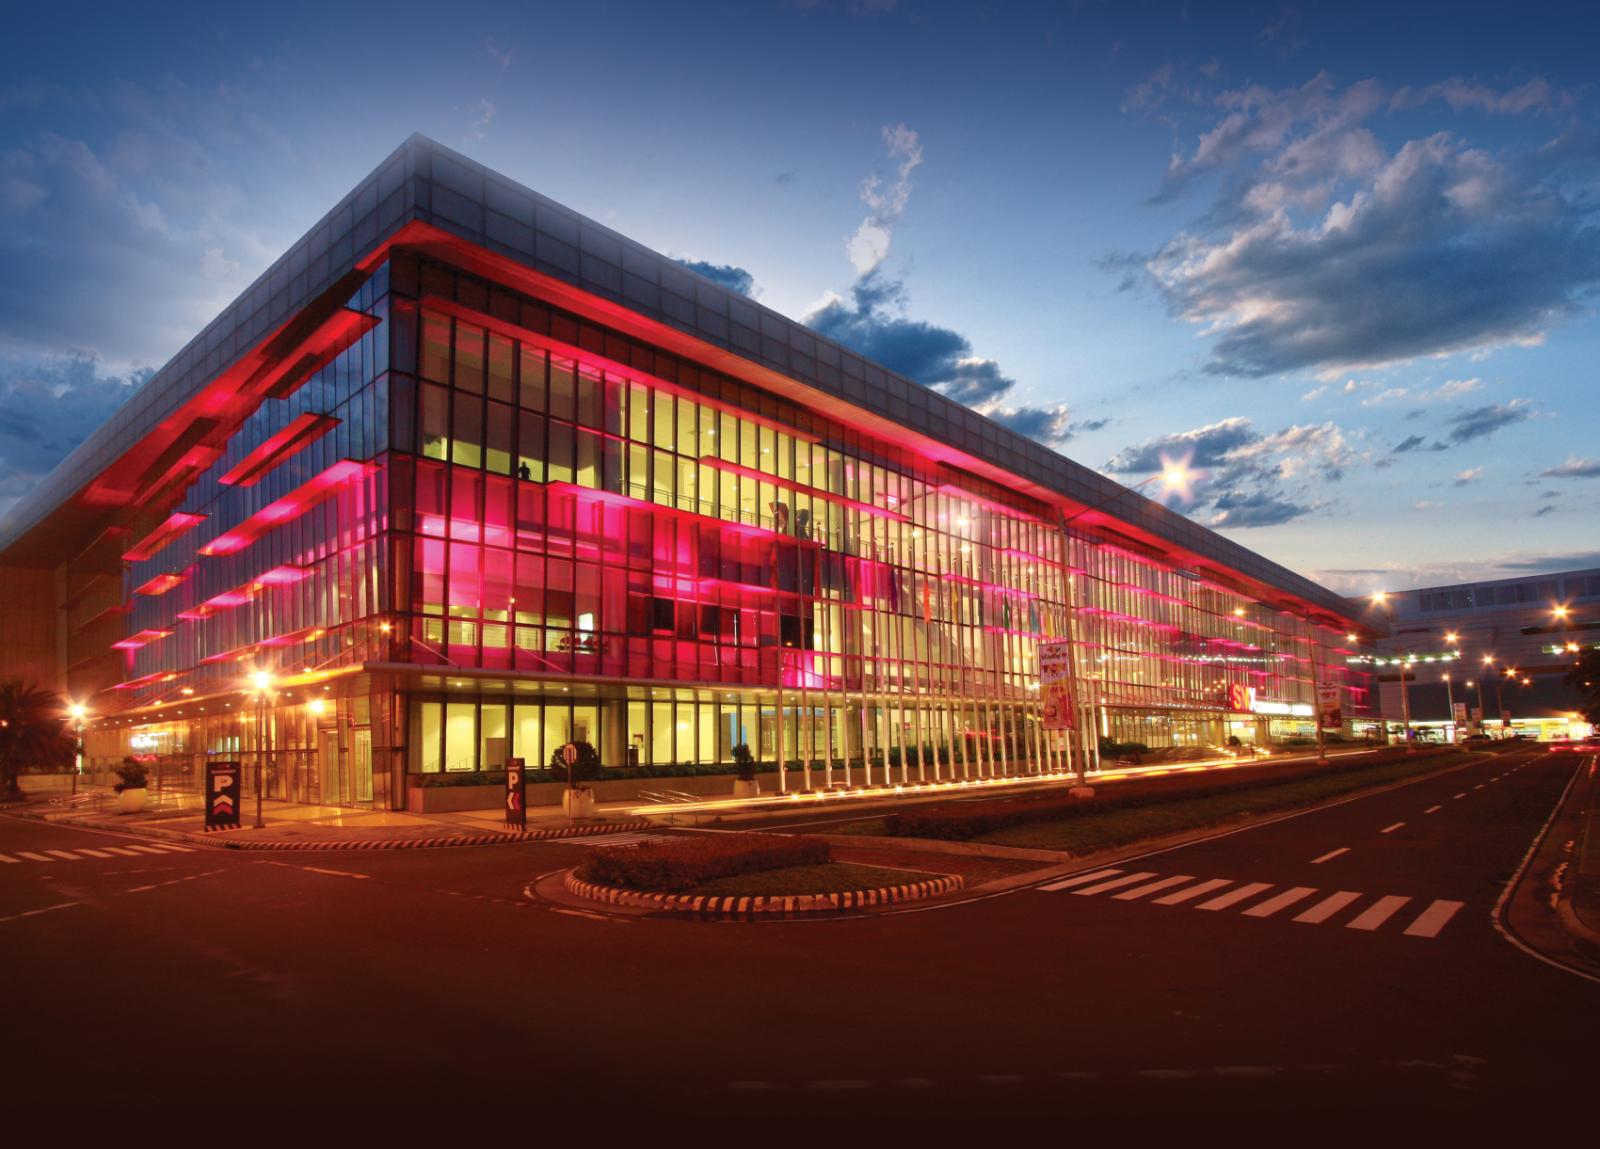 马尼拉SMX会议中心SMX Convention Center